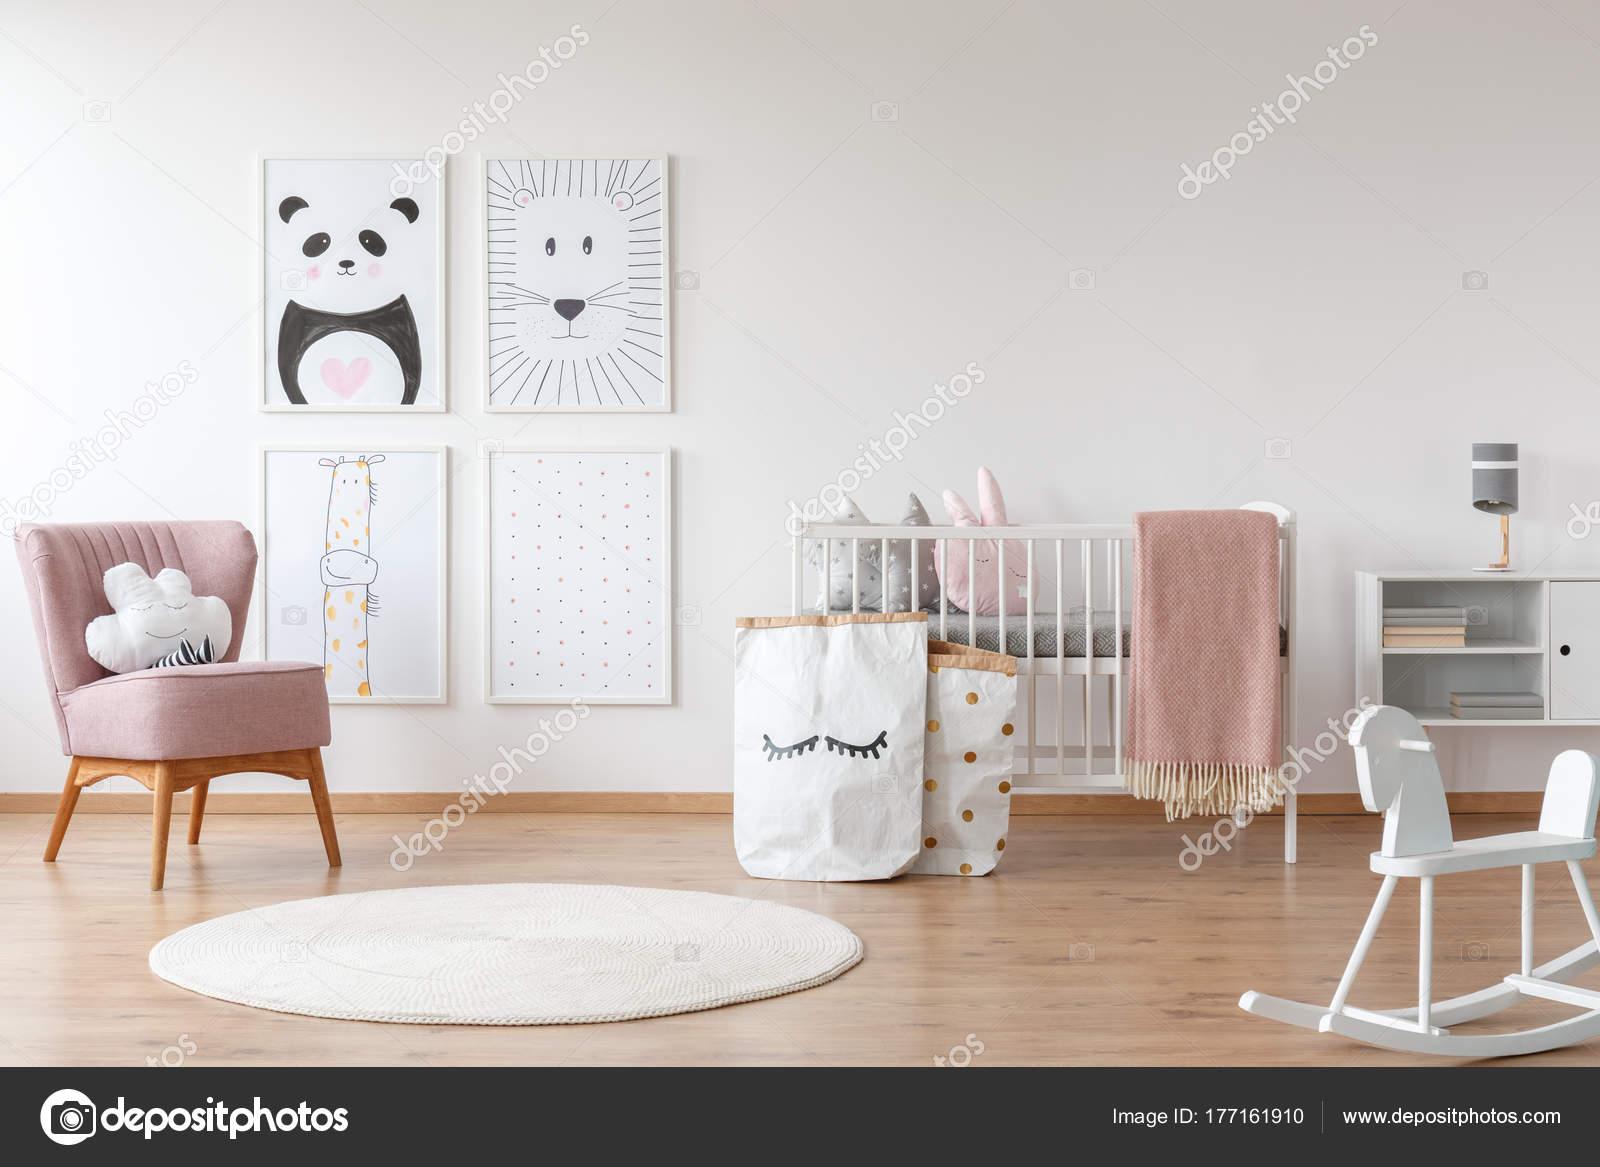 Nachtkastje Kinderkamer Afbeeldingen : Roze fauteuil in kinderkamer u stockfoto photographee eu